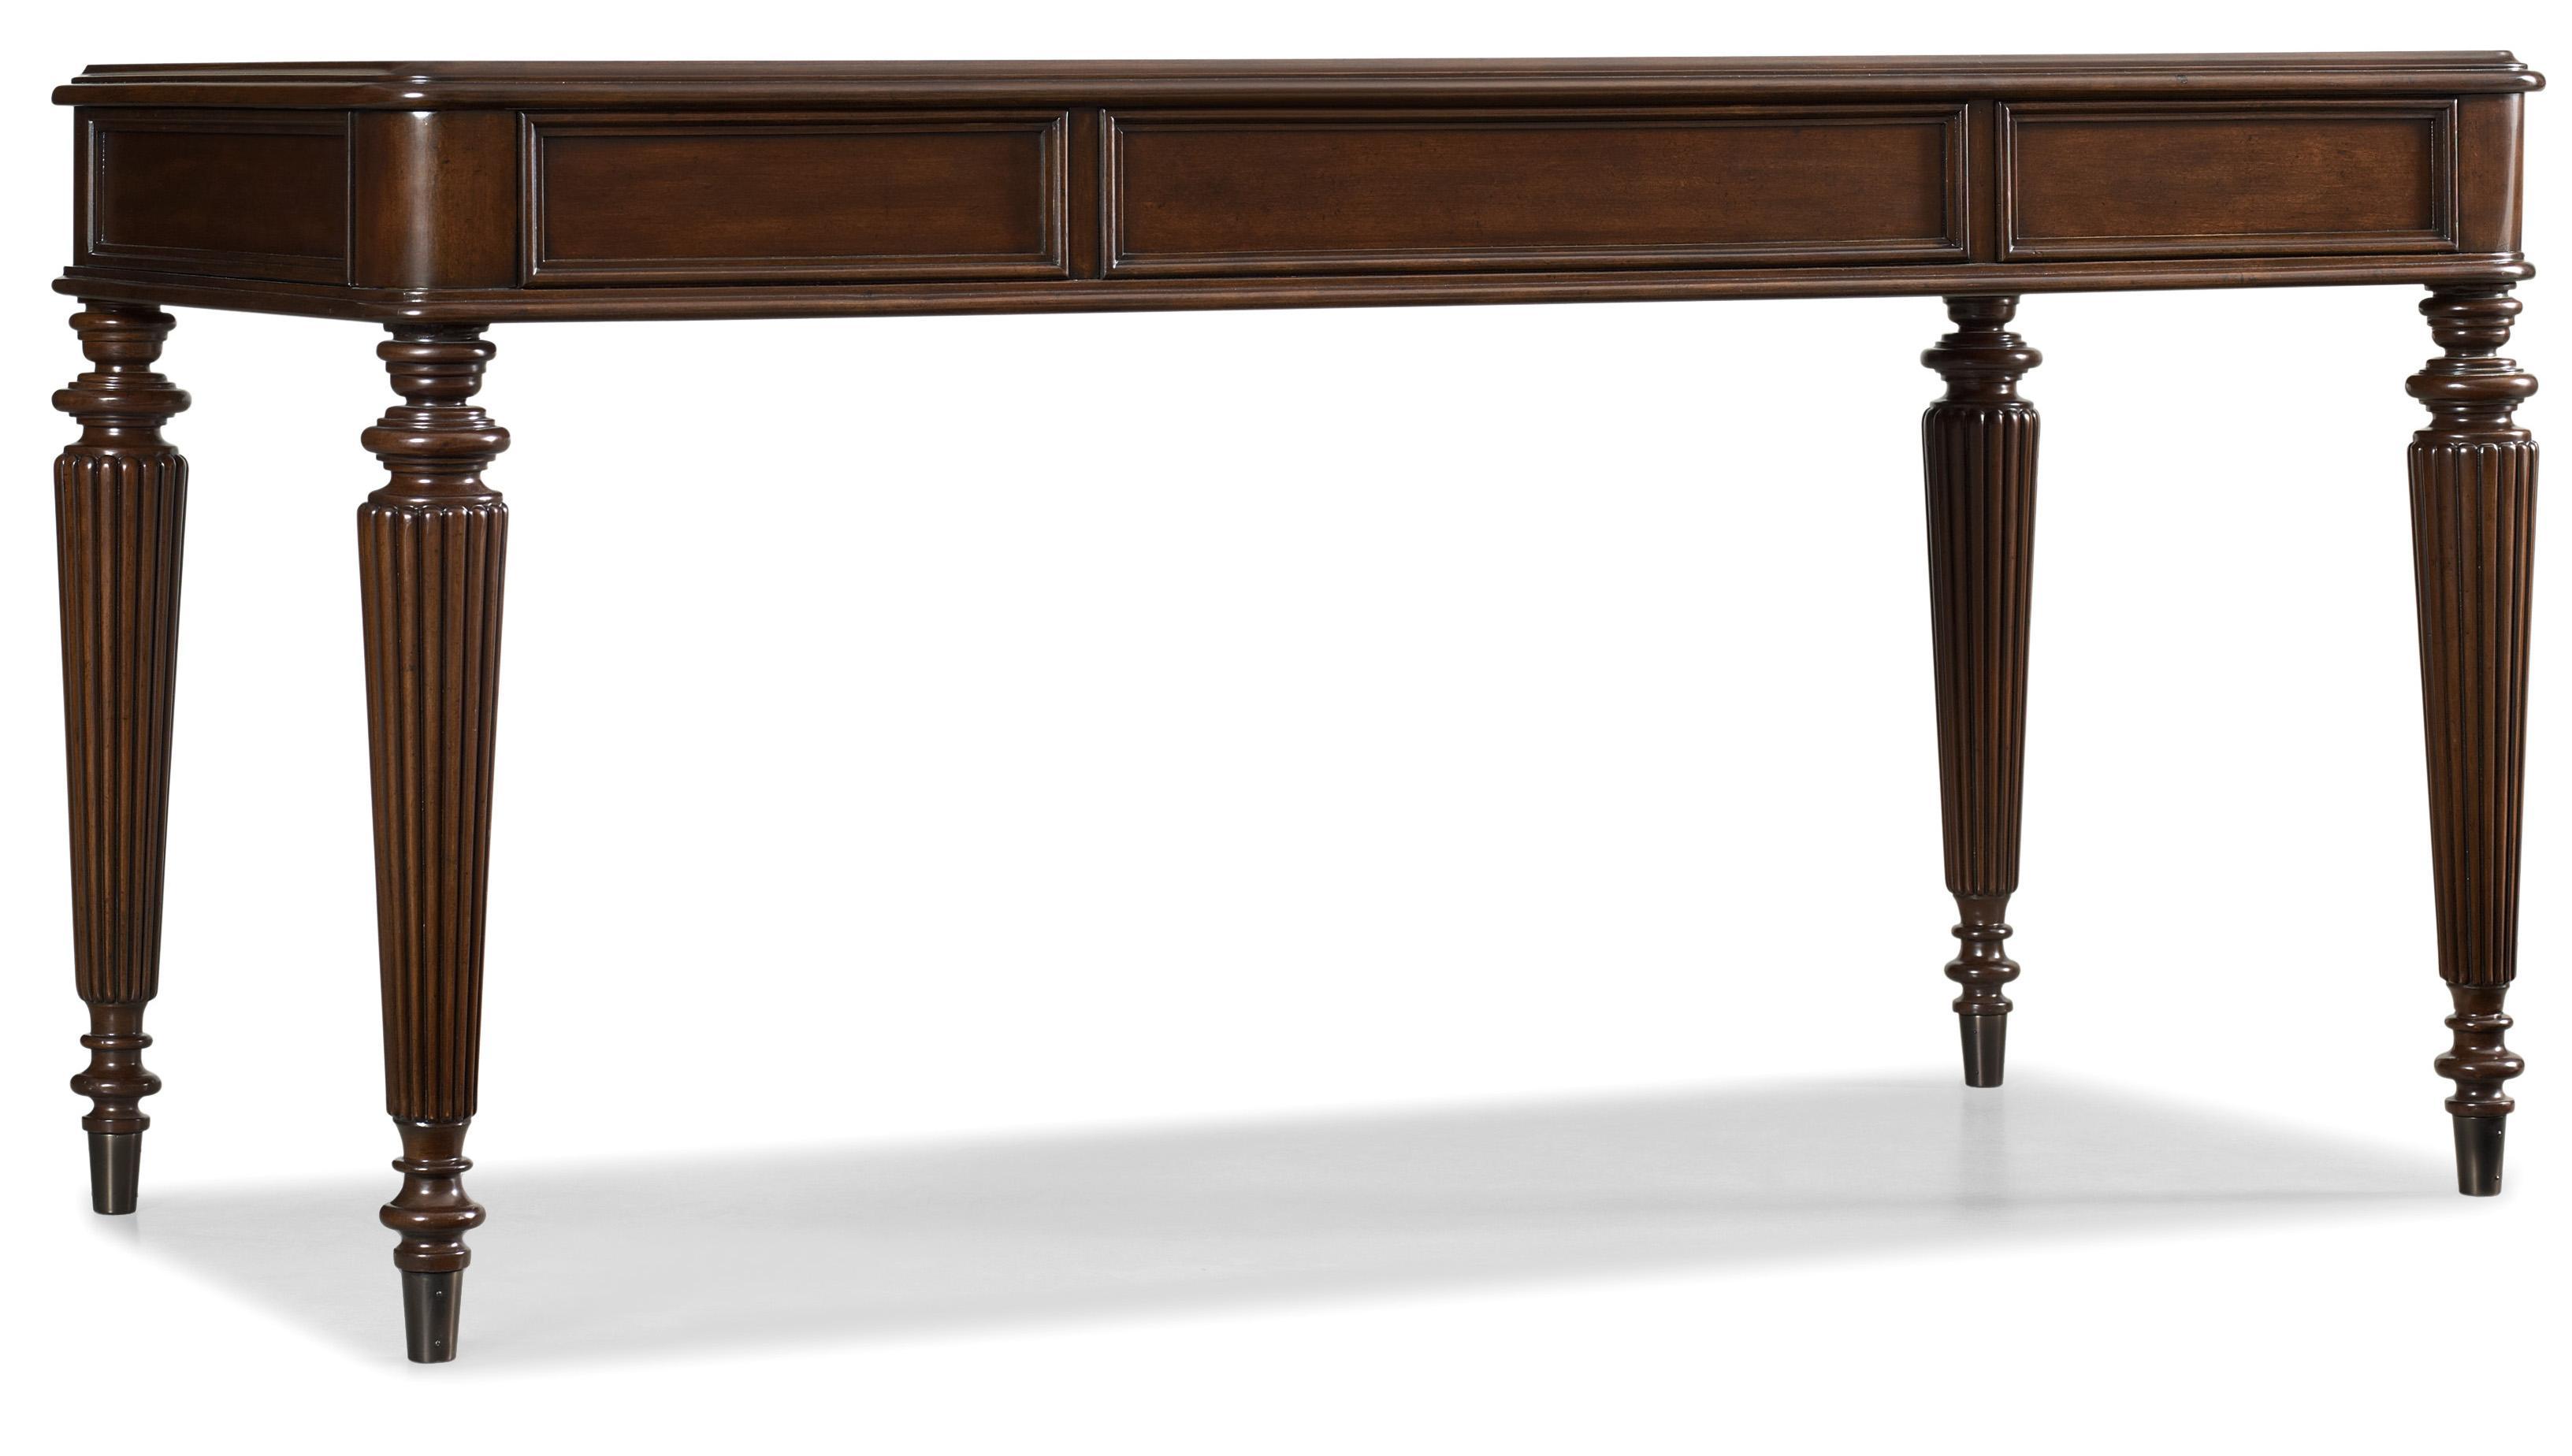 Hamilton Home Home Office Leg Desk - Item Number: 5085-10458